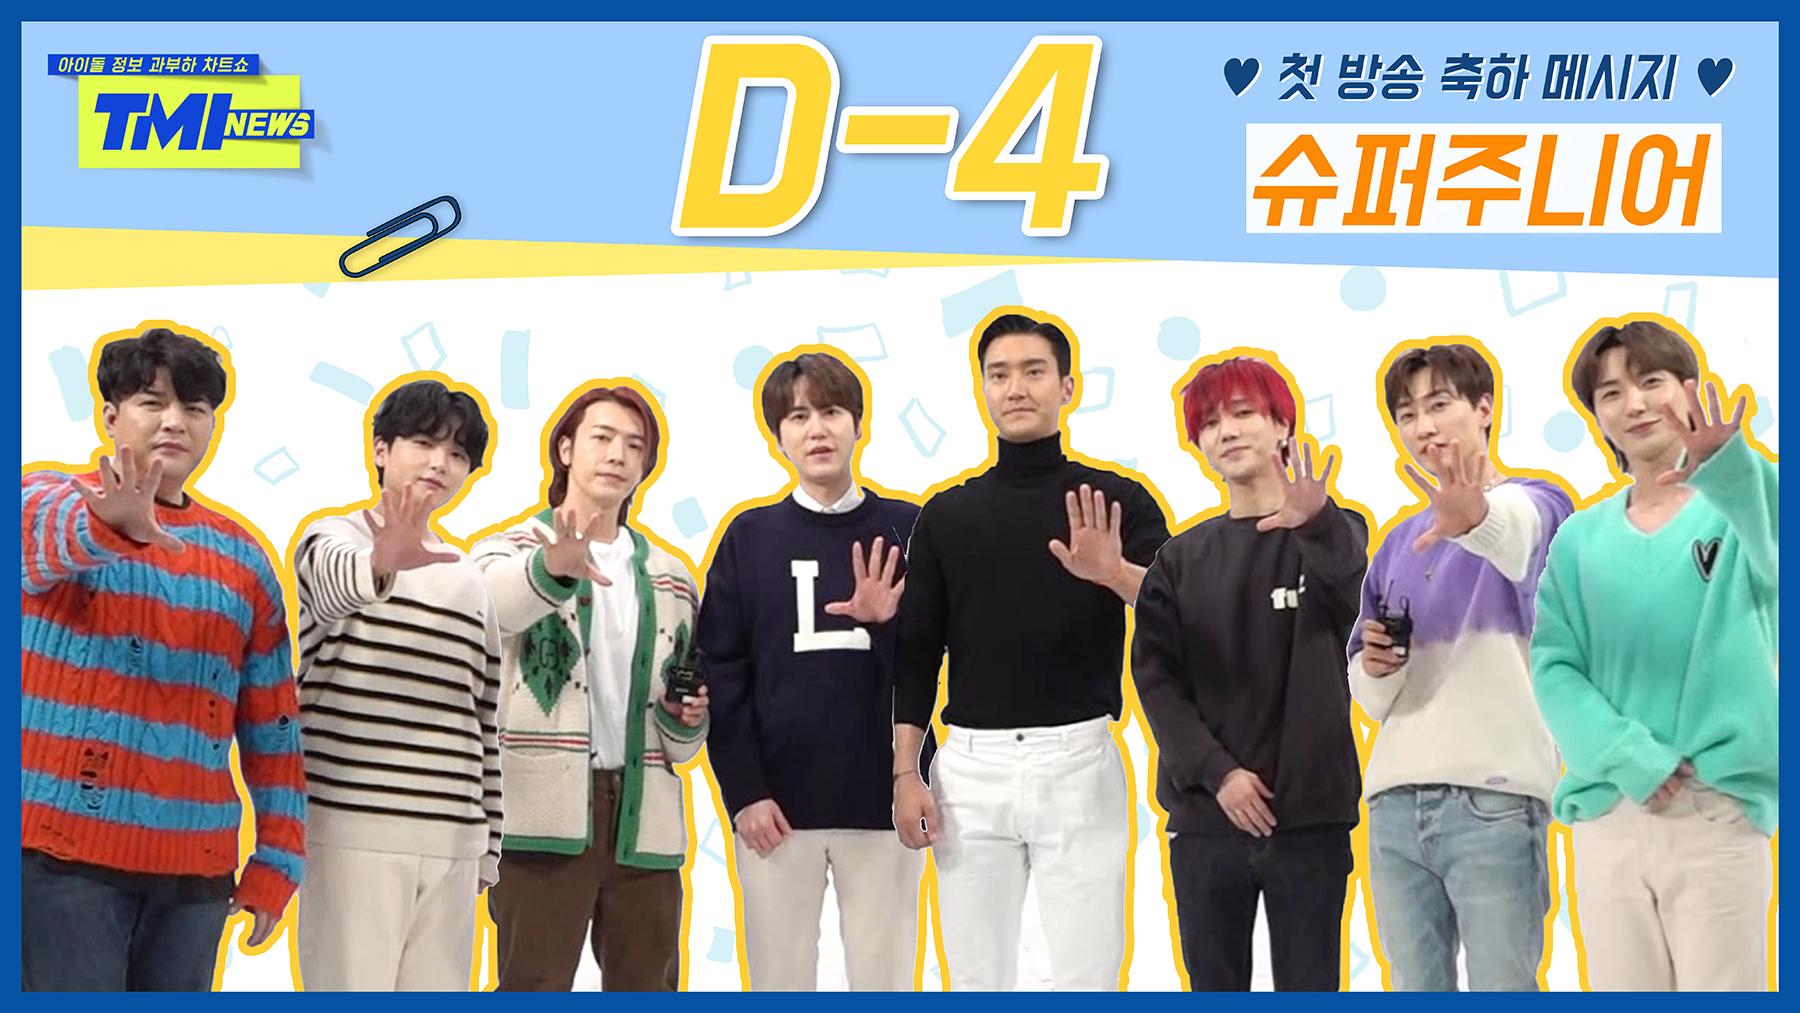 [TMI NEWS] '첫방 D-4' 축하 메시지♥ from.슈퍼주니어